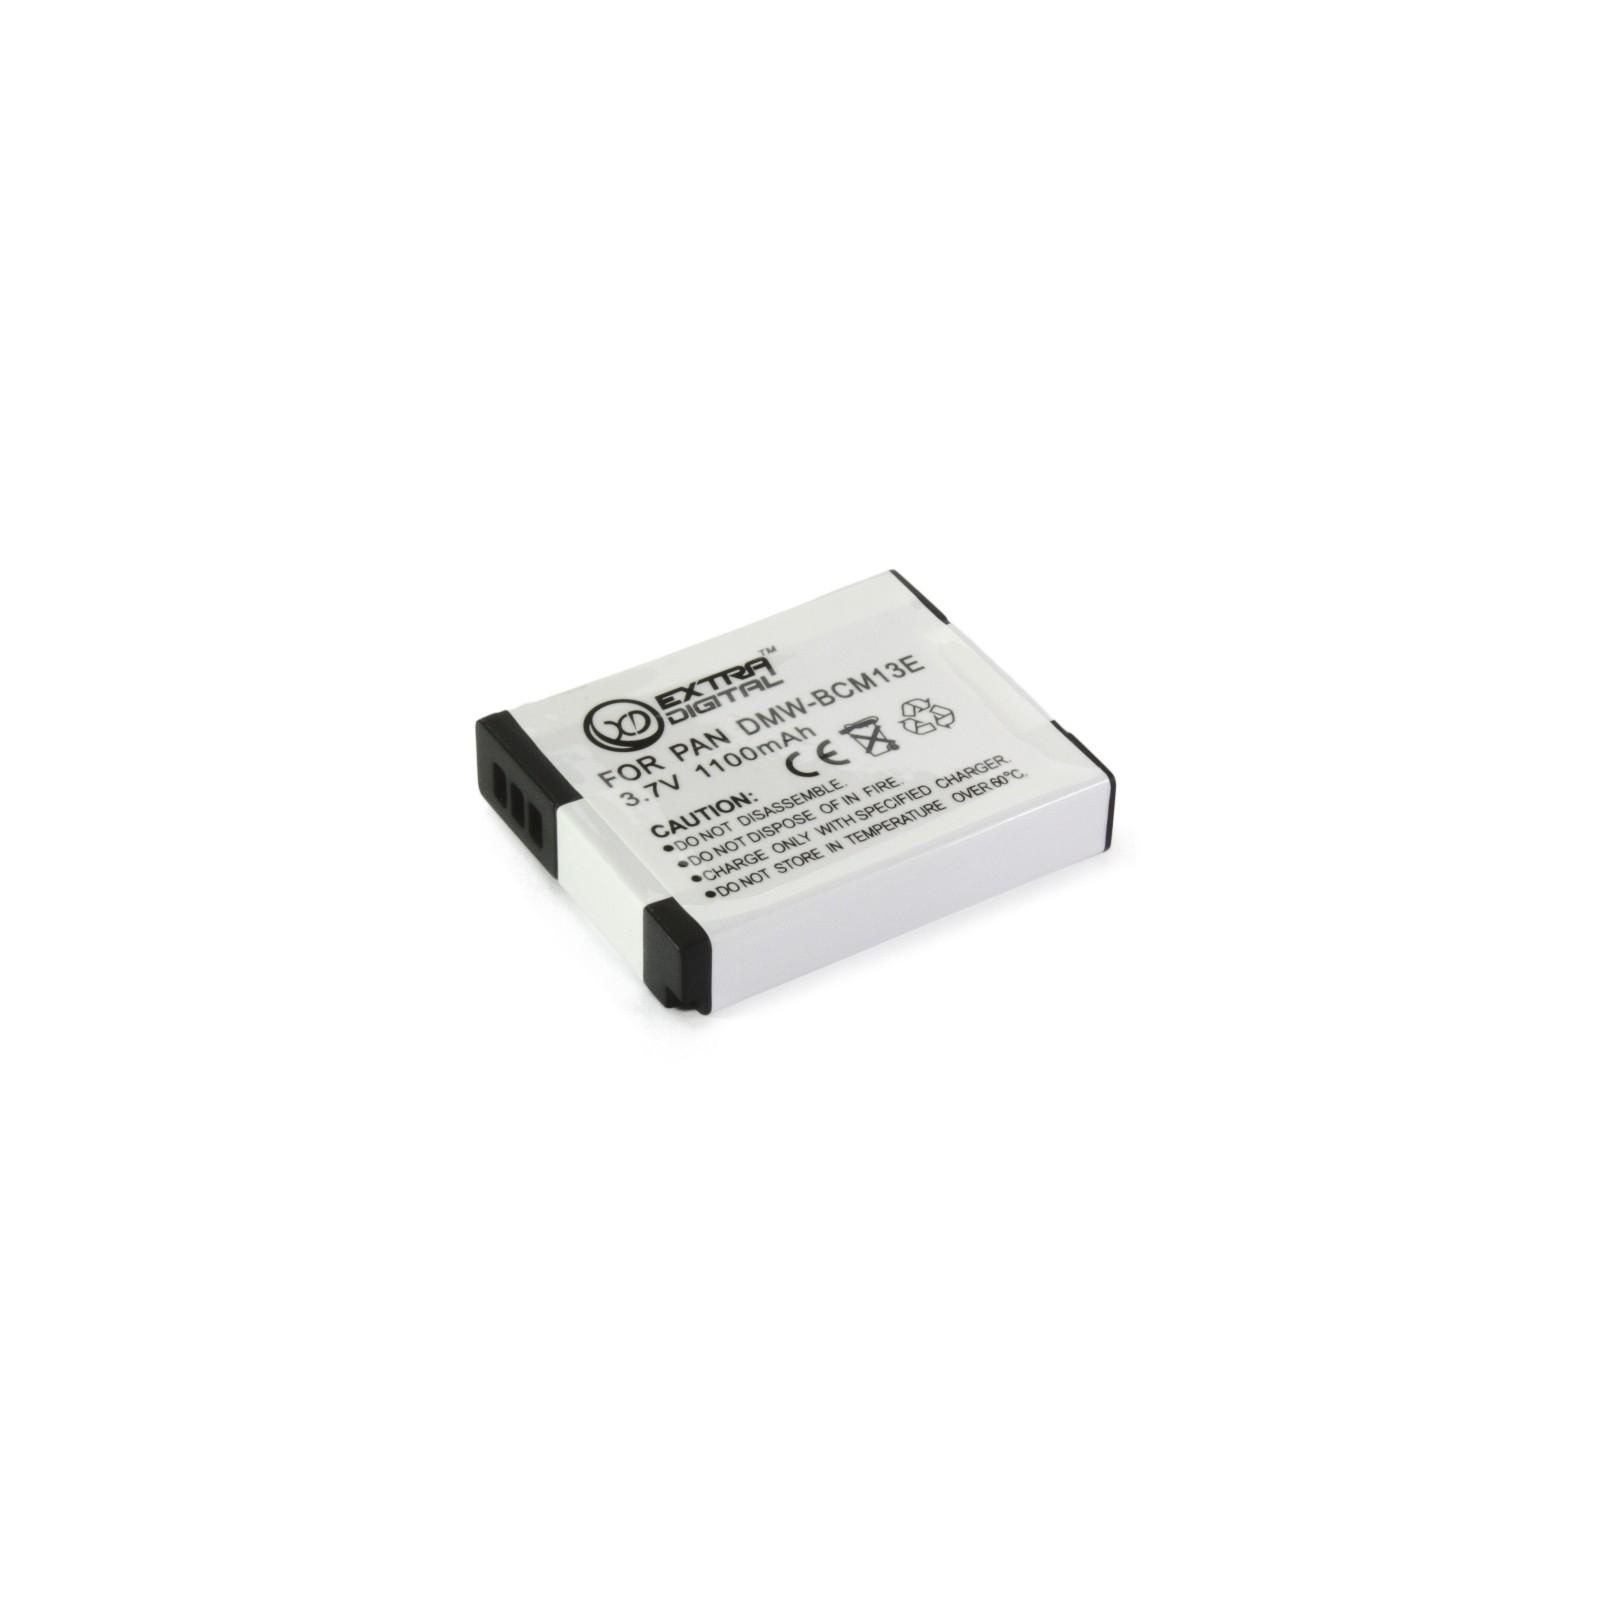 Аккумулятор к фото/видео EXTRADIGITAL Panasonic DMW-BCM13E (BDP1291) изображение 5